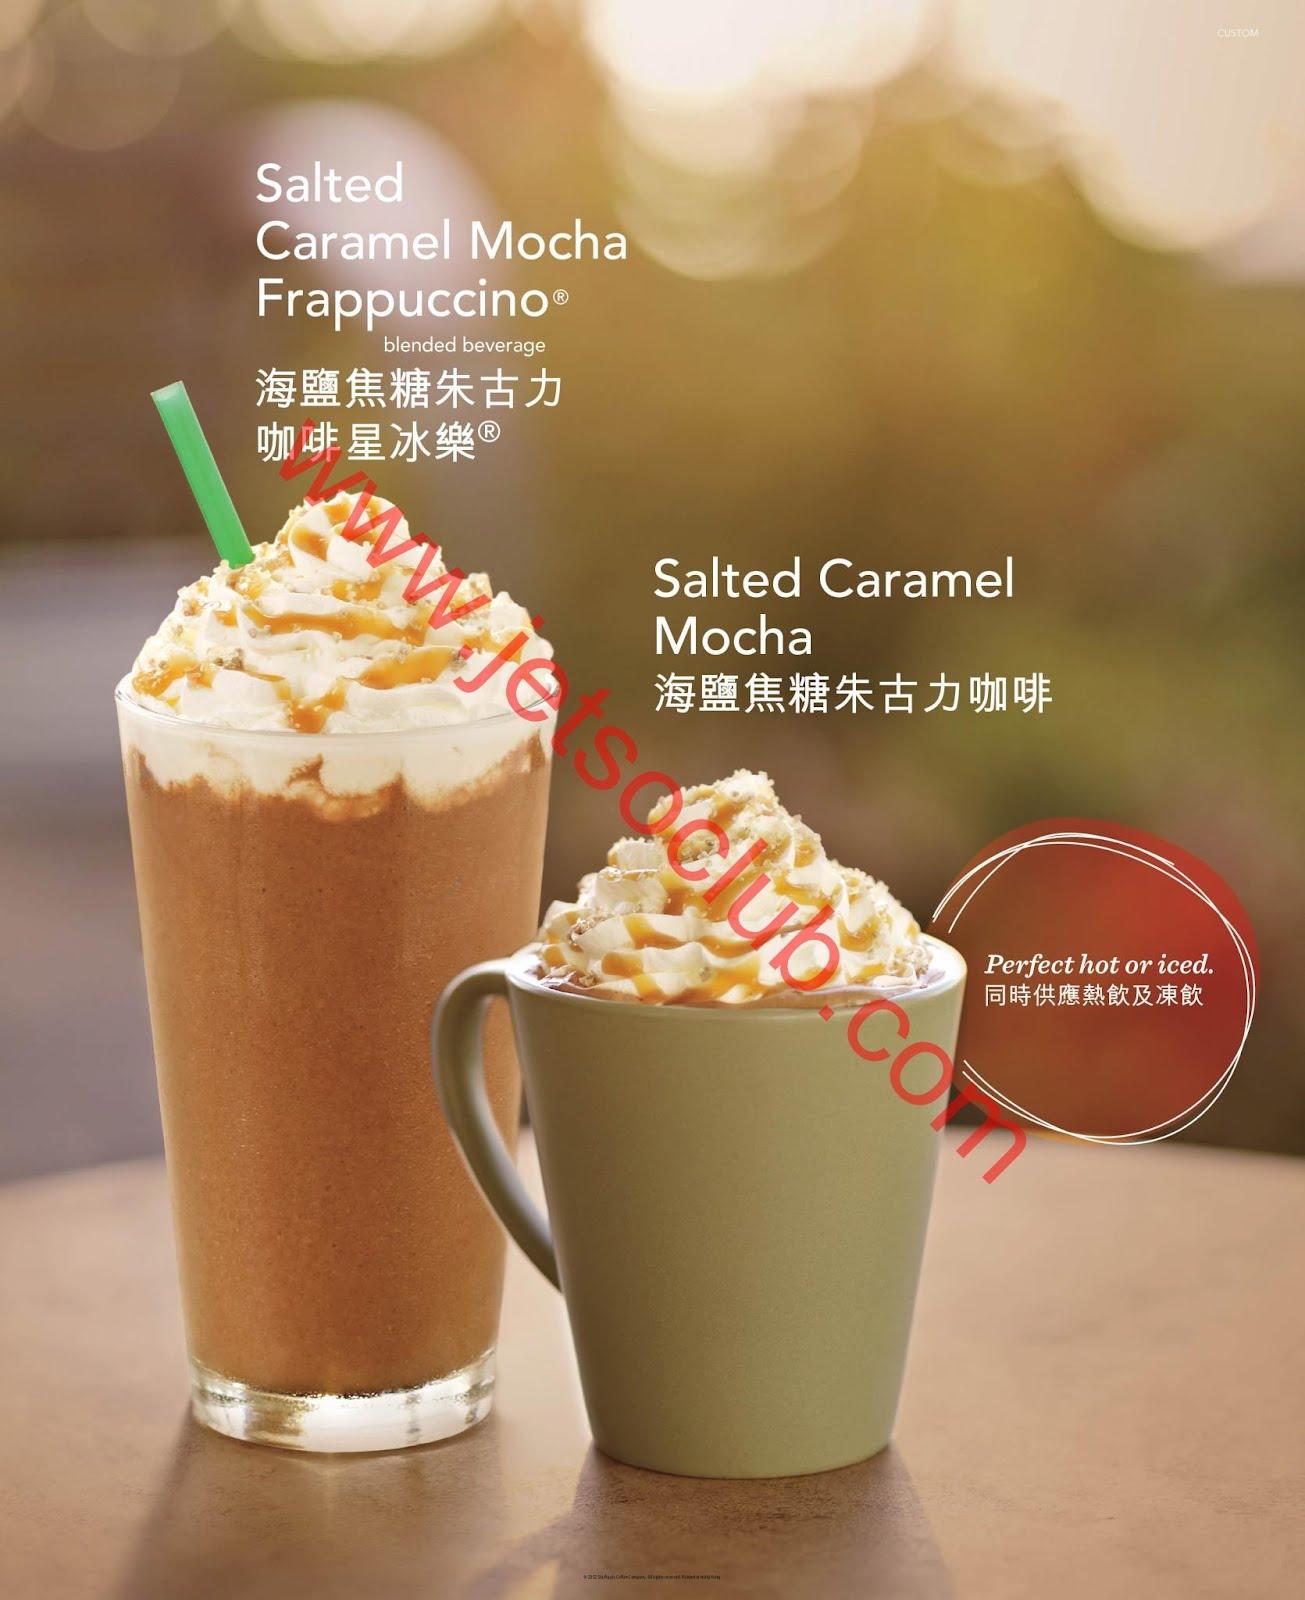 Starbucks星巴克:新口味 海鹽焦糖朱古力咖啡系列 - 憑星巴克卡購買 享免費升級優惠(至17/9) ( Jetso Club 著數 ...